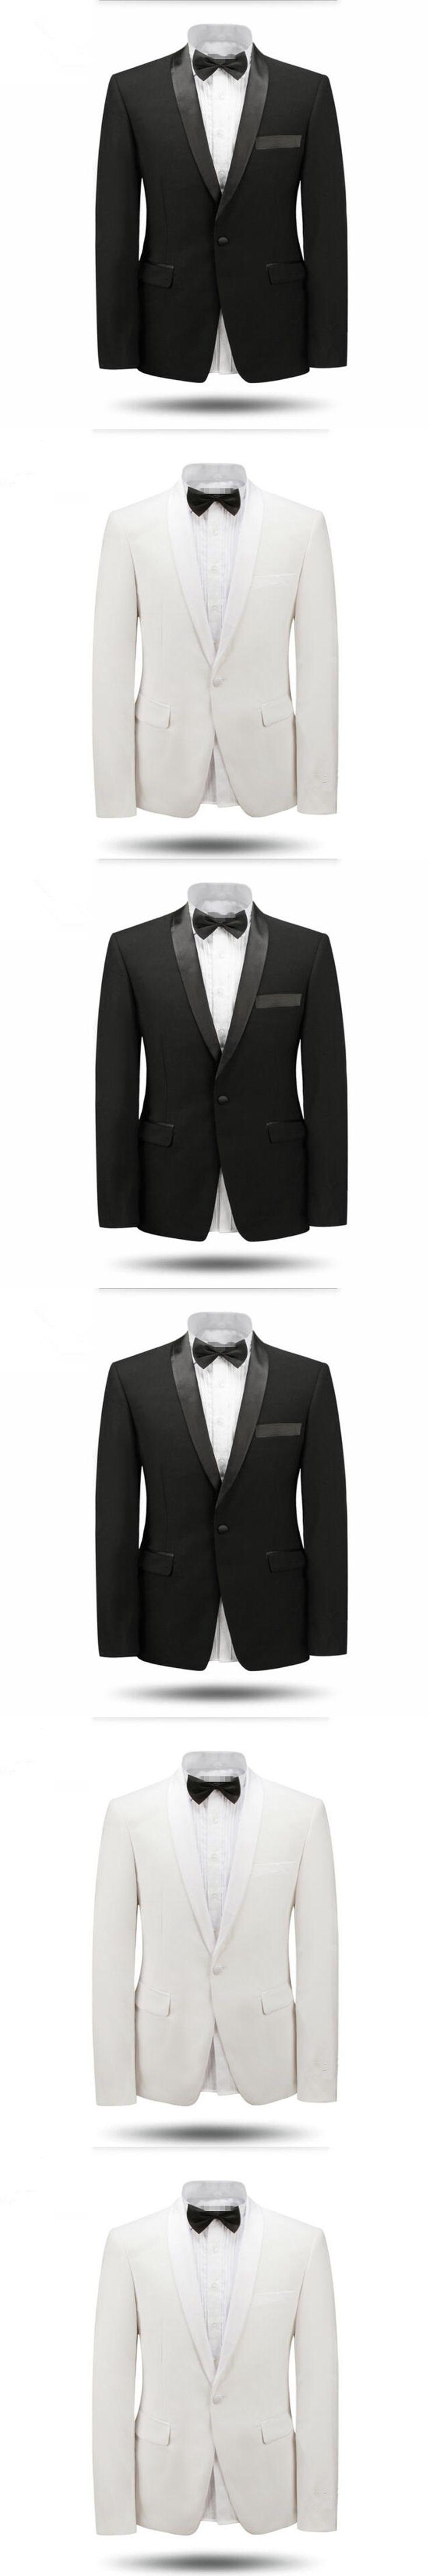 White and black men suits jacket shawl collar wedding tuxedos jacket custom made fashion formal business suits jacket